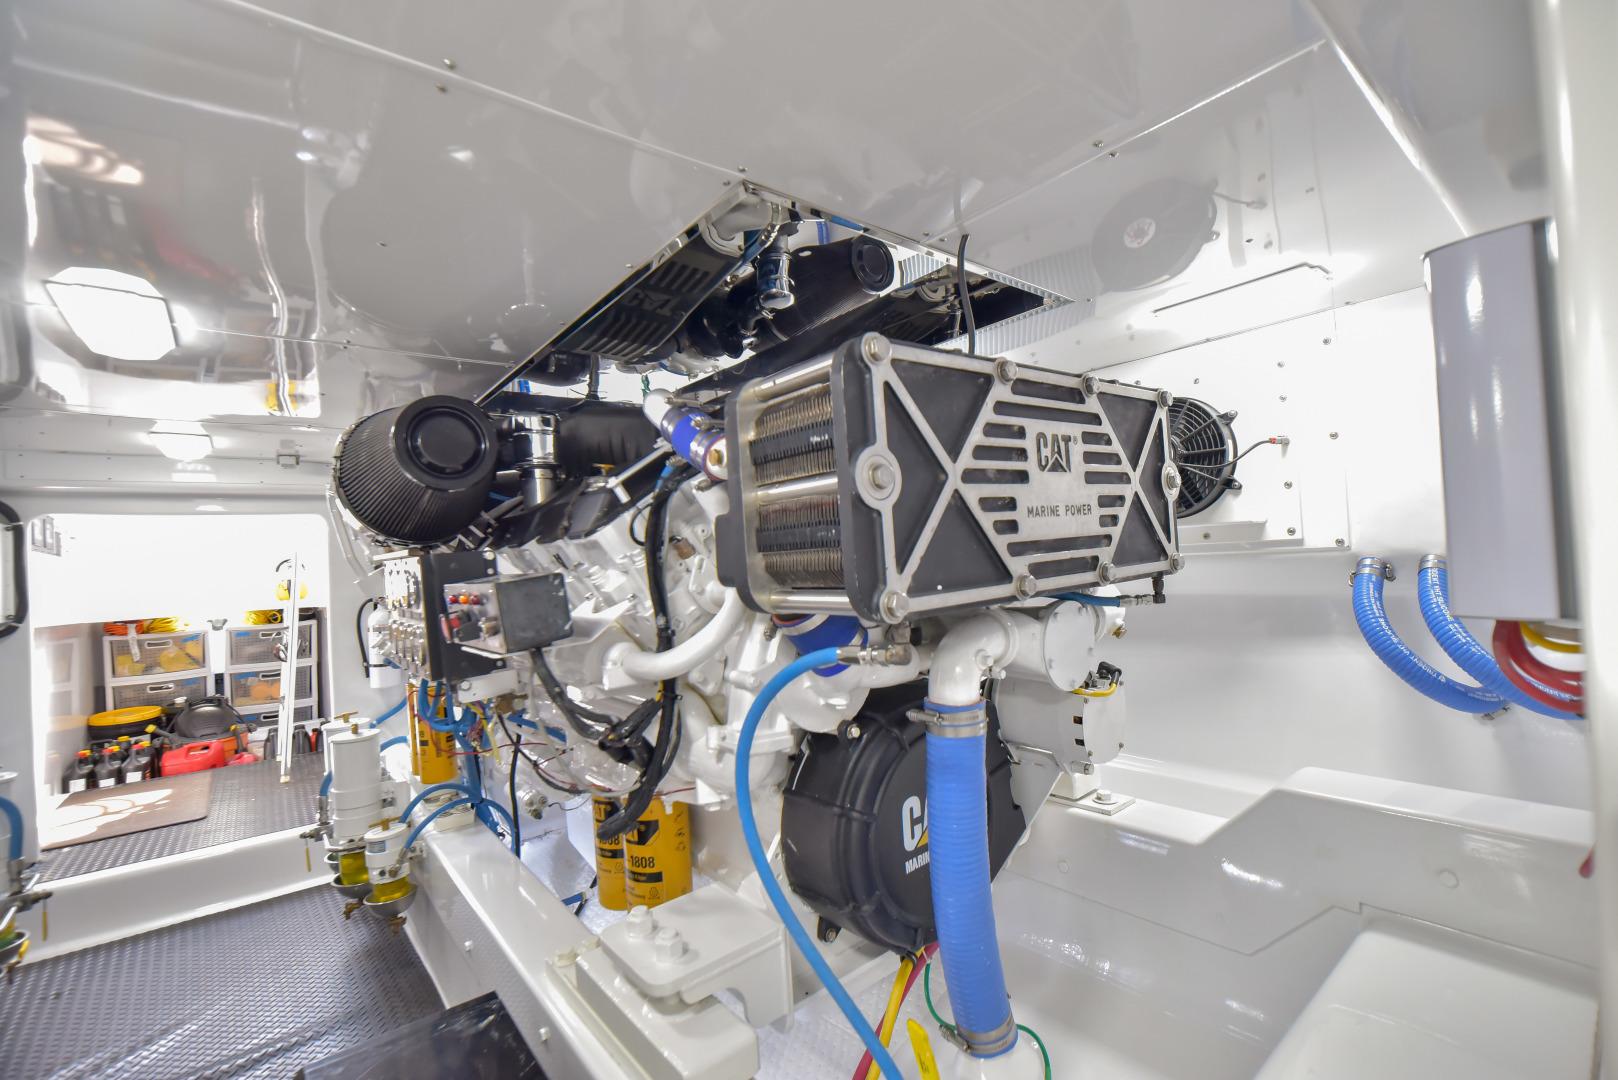 F&S-63 Convertible 2005-Sea Angel Anna Maria-Florida-United States-2005 F&S 63 Convertible  Sea Angel Engine Room-1159300   Thumbnail